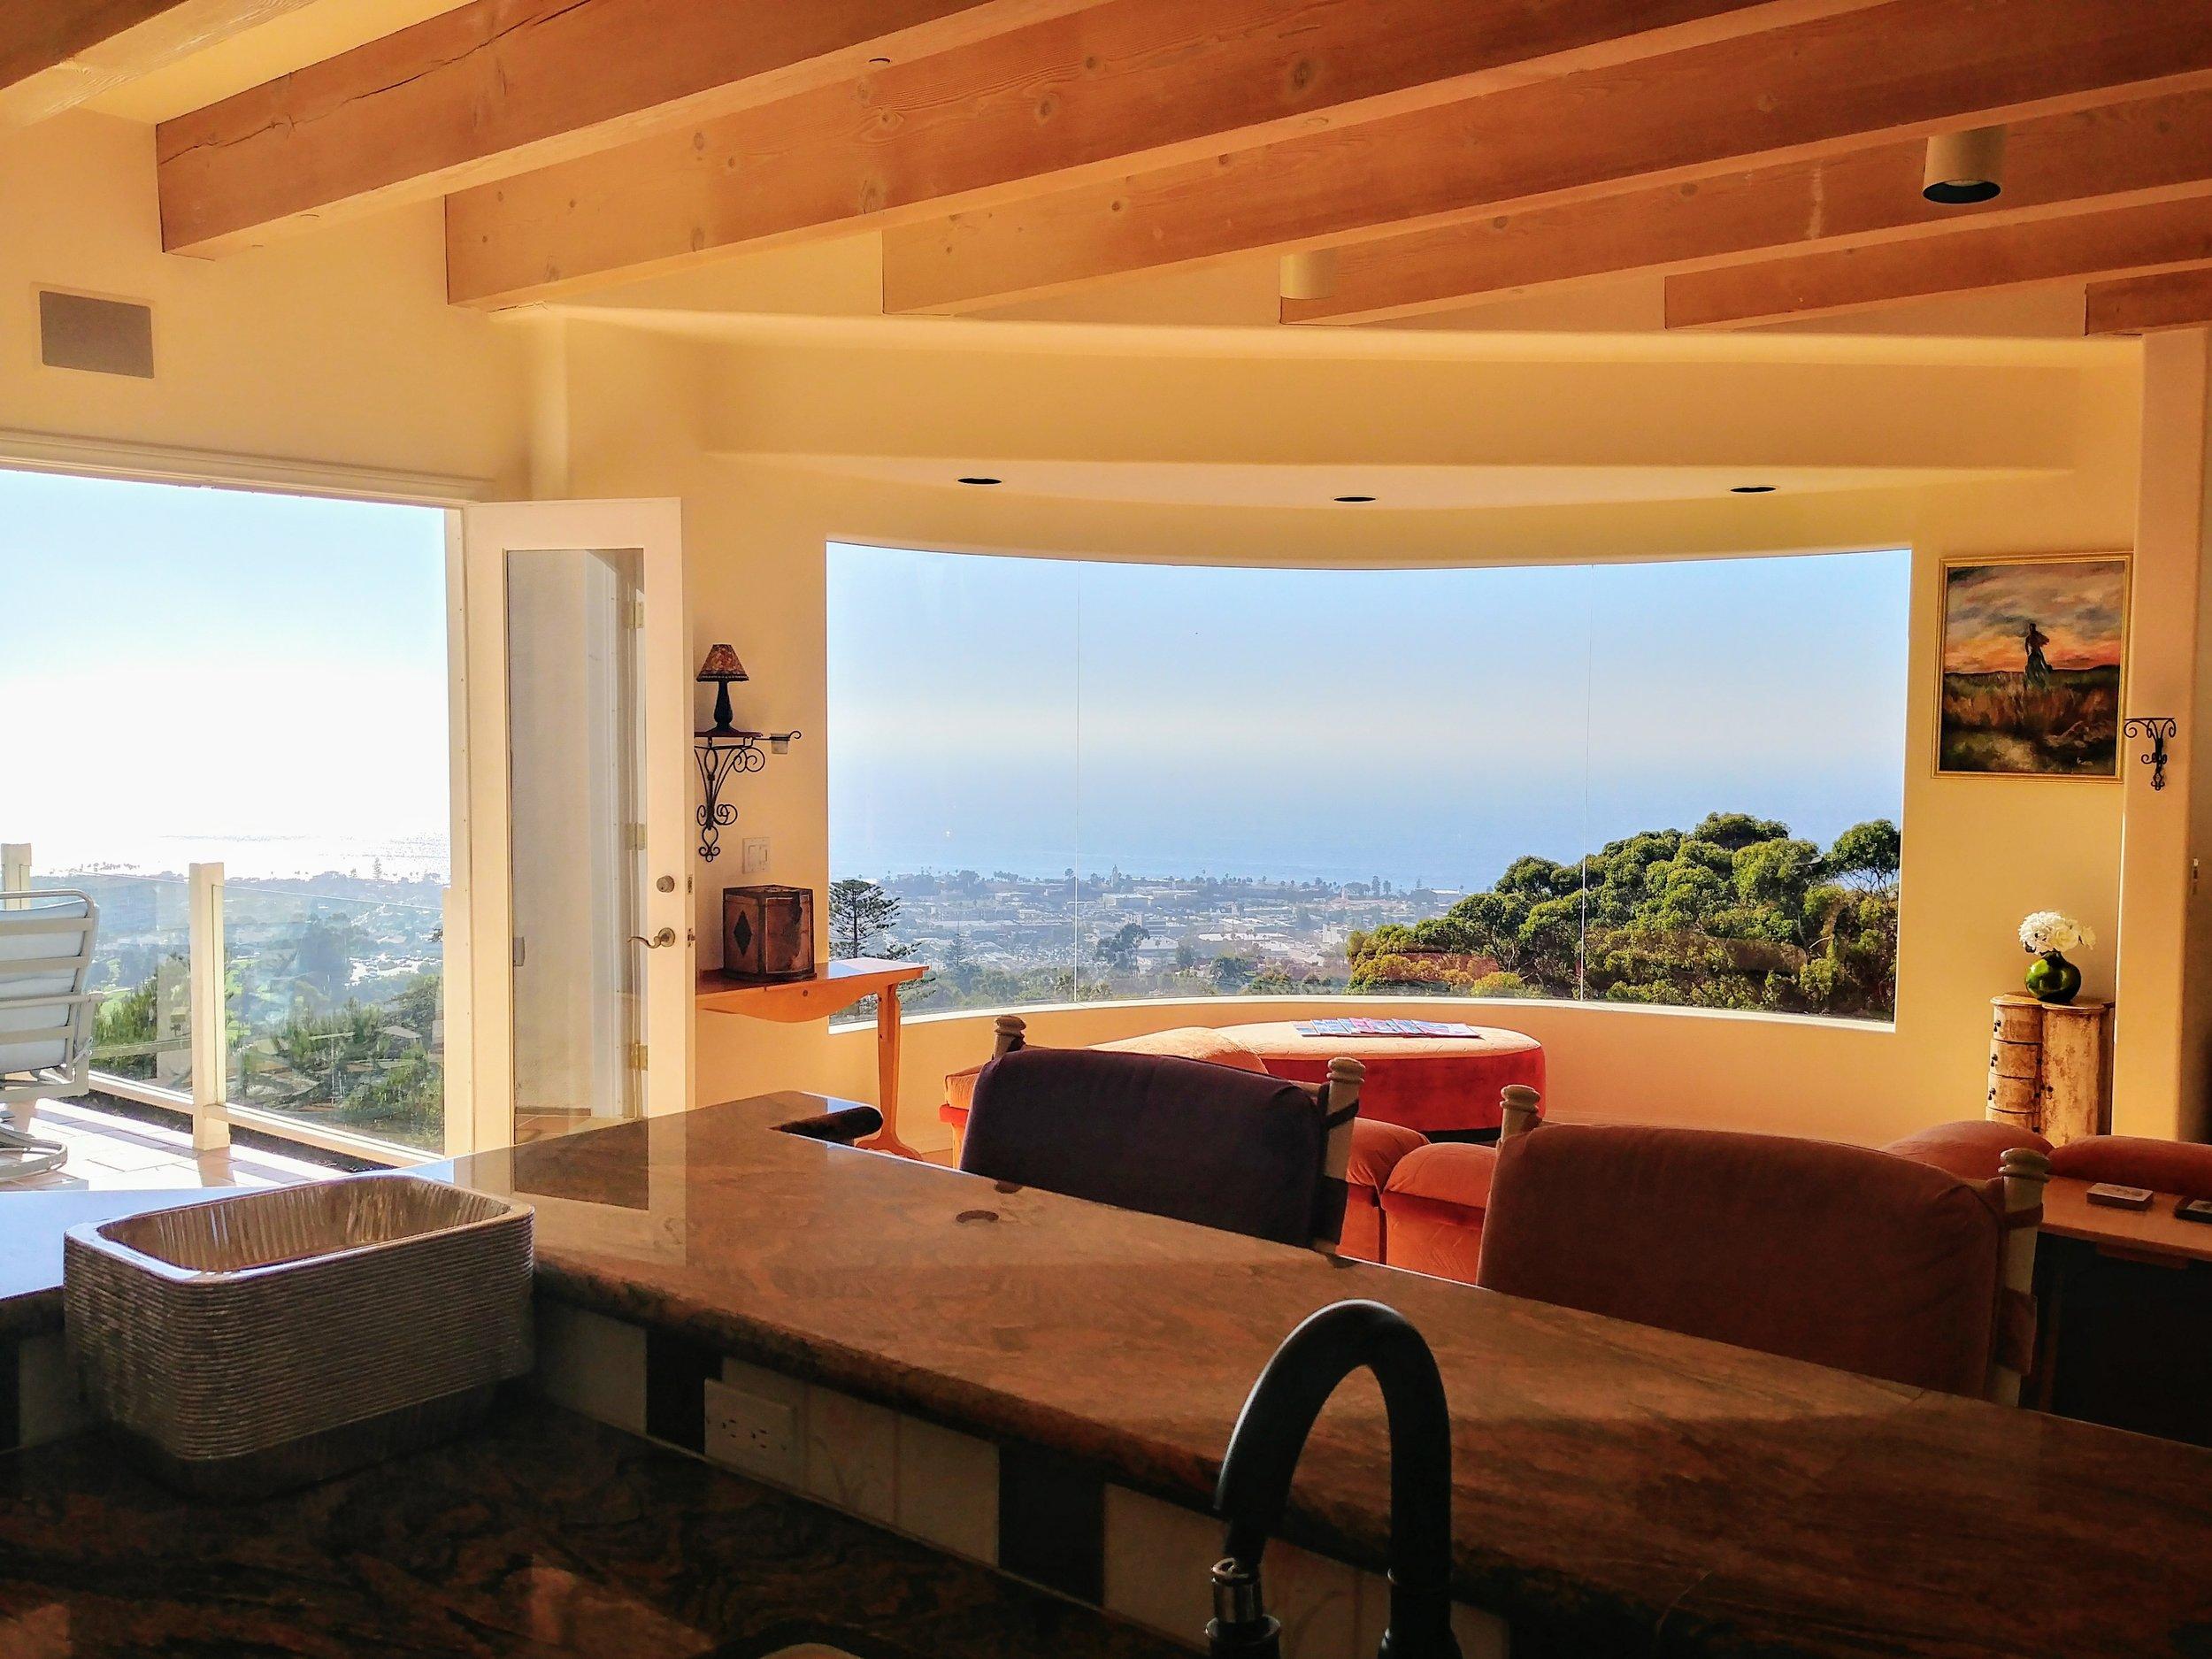 Diary of a Personal Chef-La Jolla View